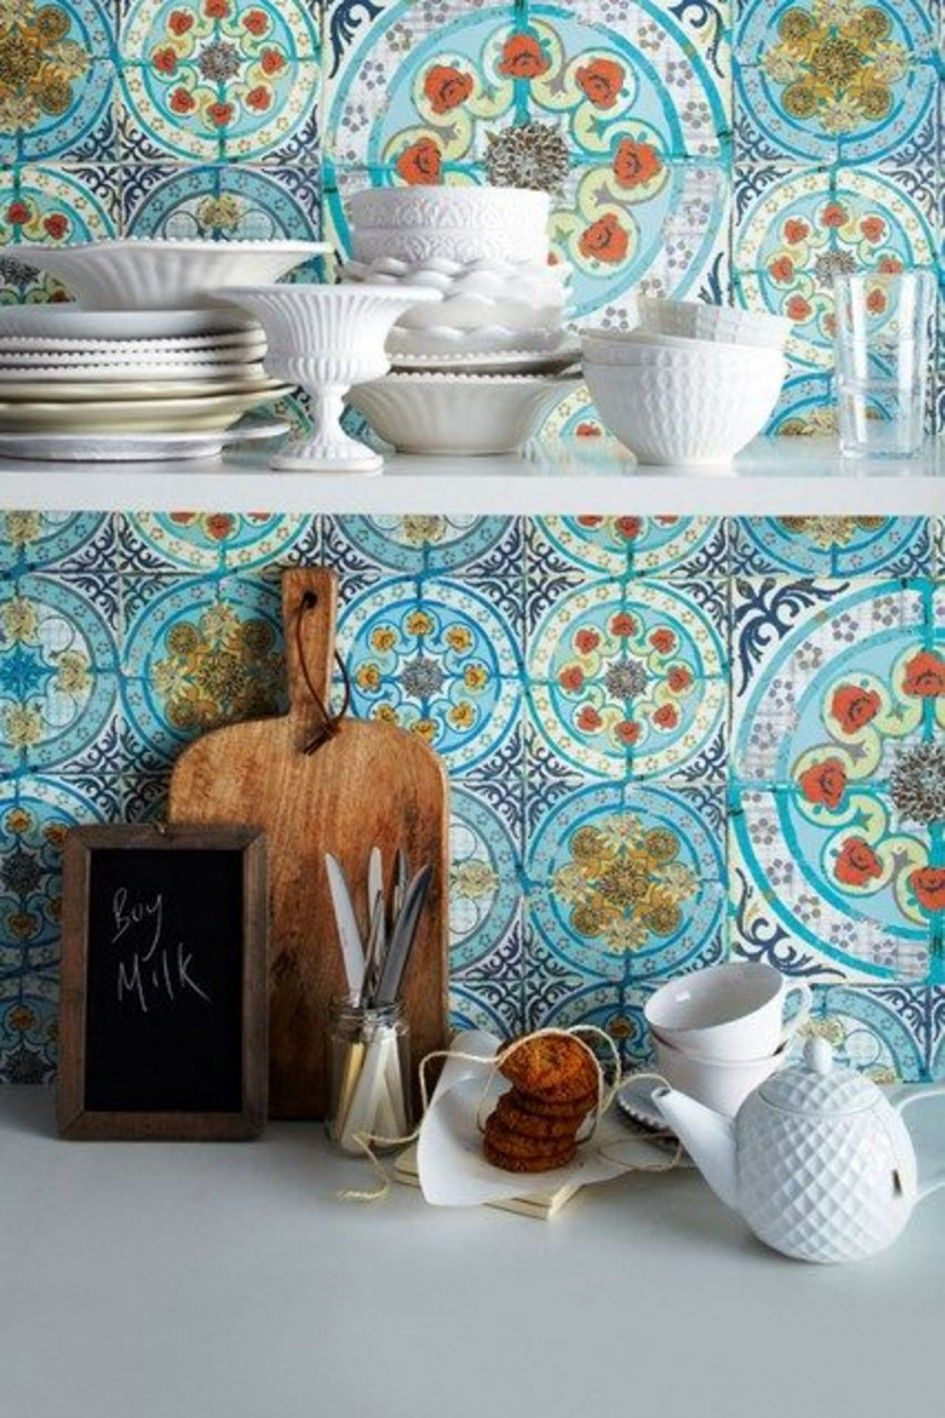 Kitchen Blue Pattern Moroccan Backsplash Tile Ceramic Material ...